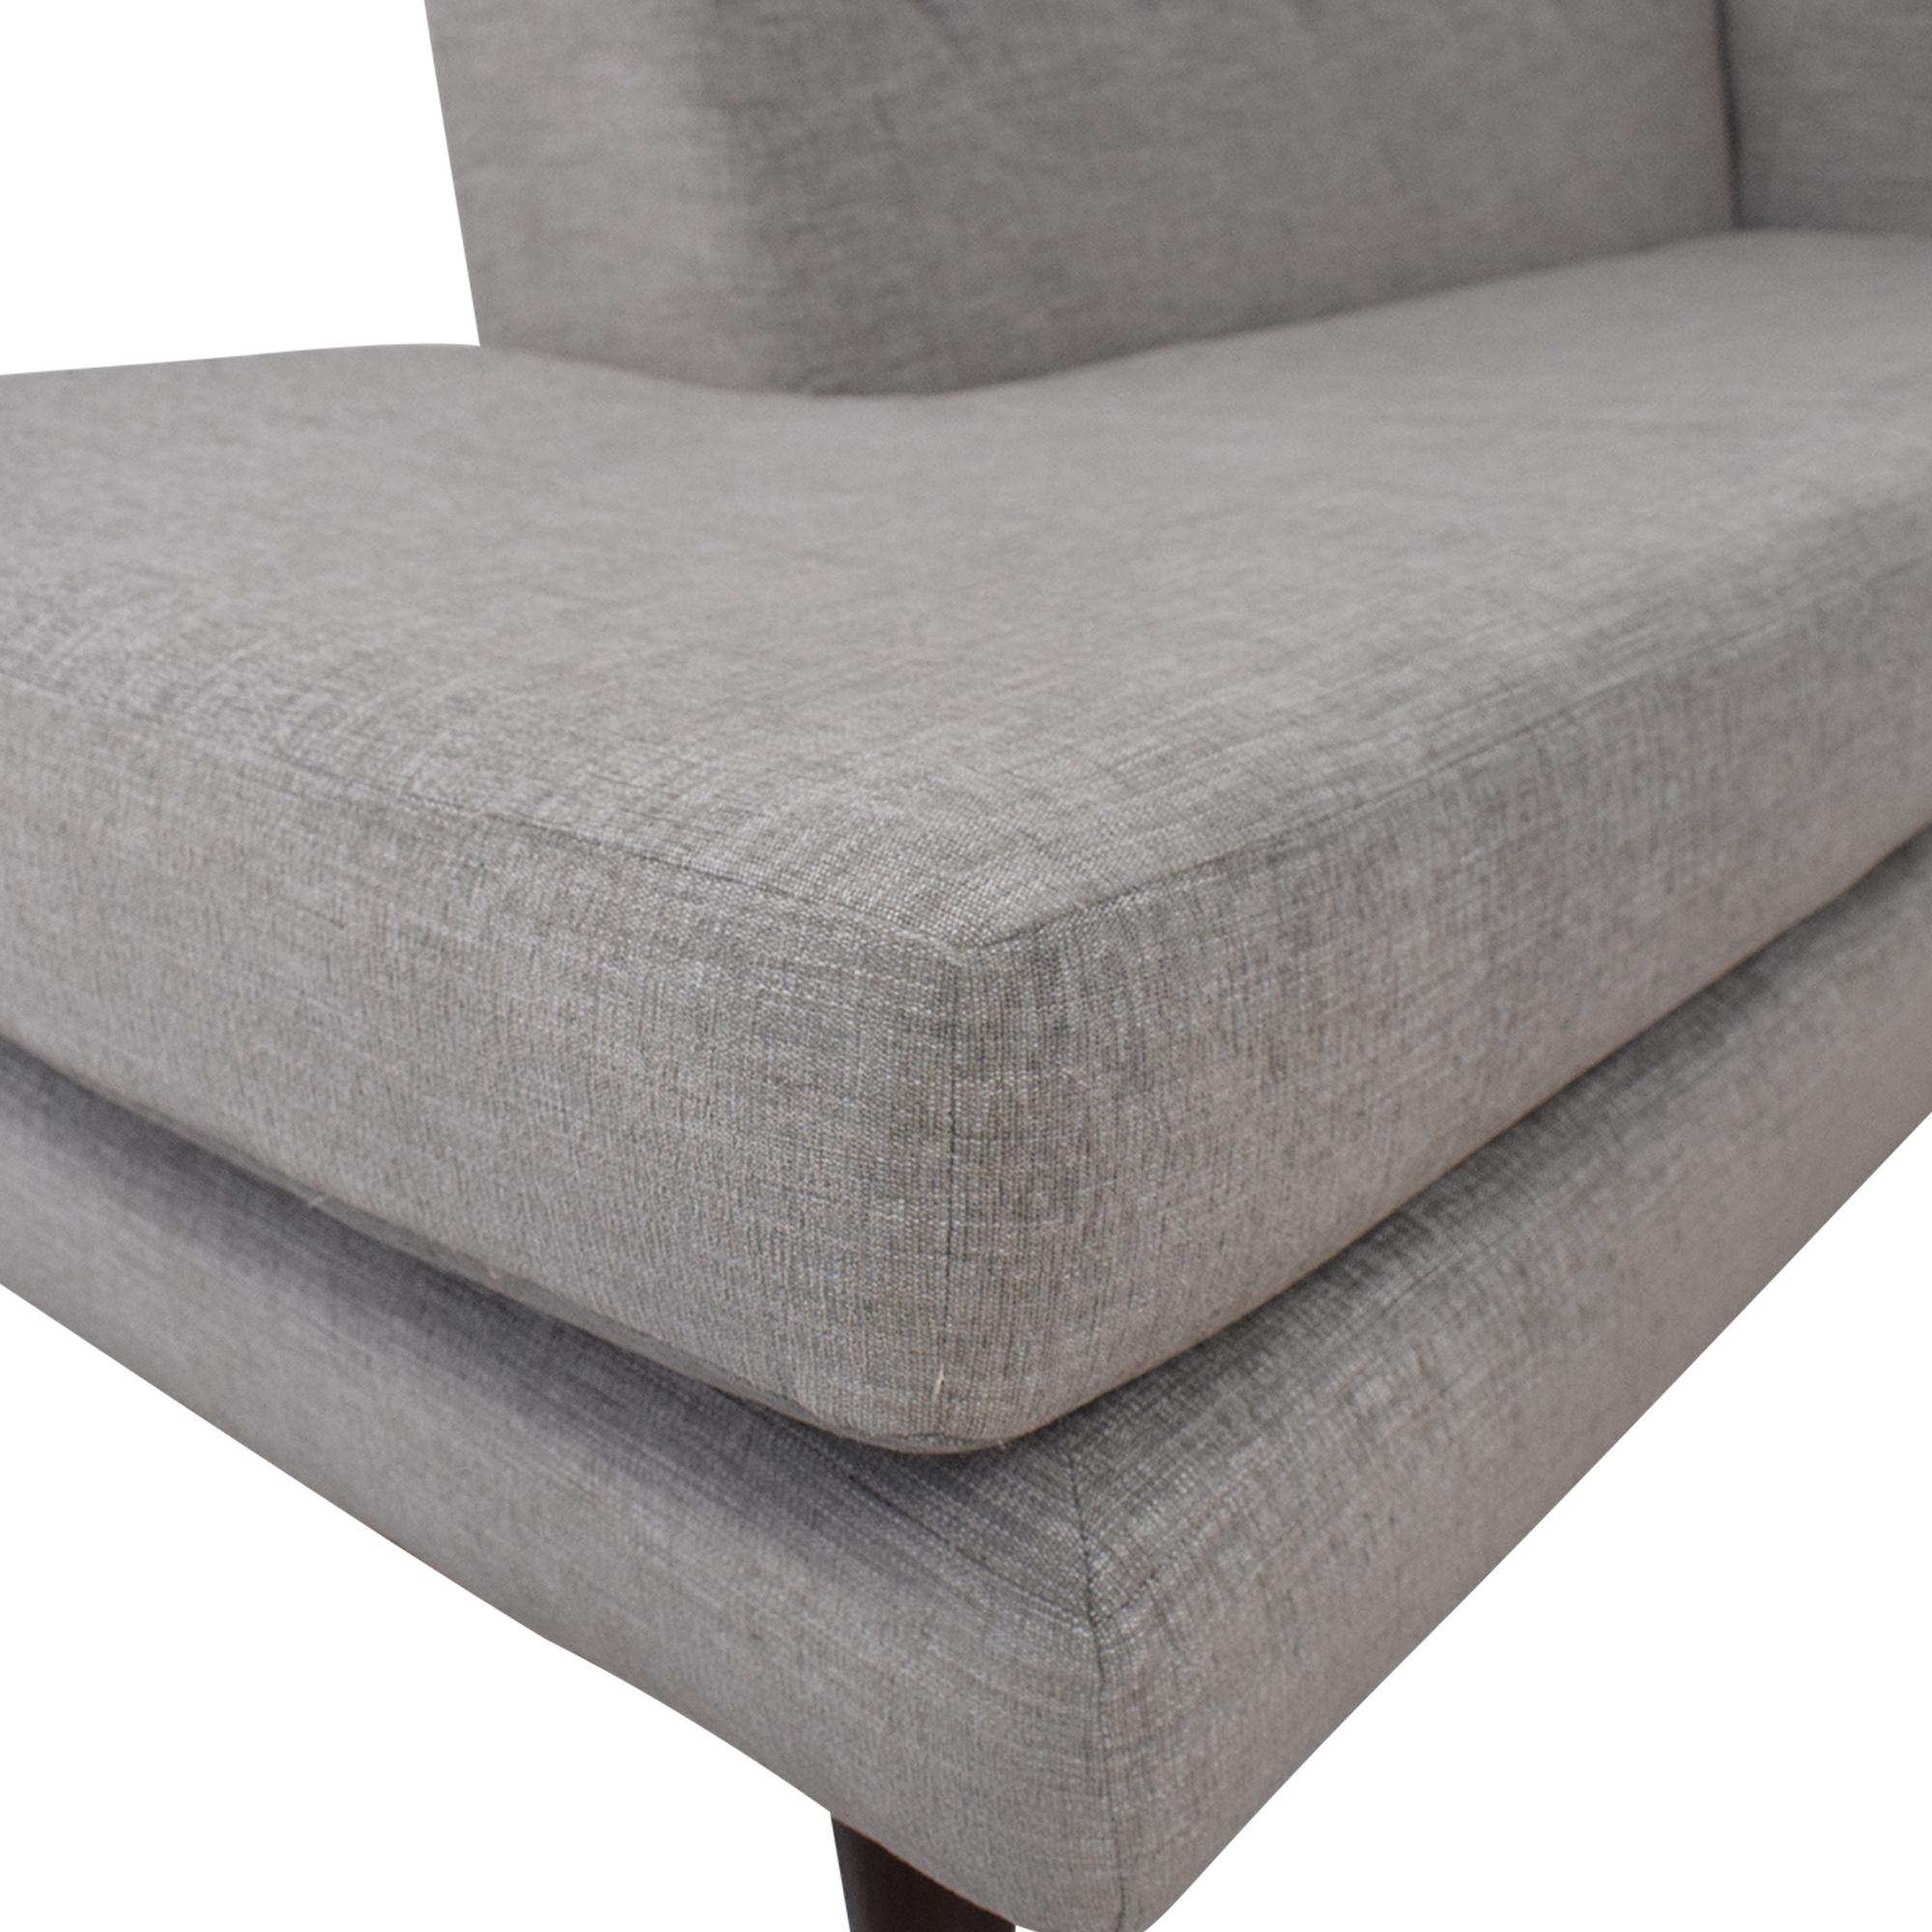 Joybird Joybird Hughes Sectional Sofa with Bumper for sale